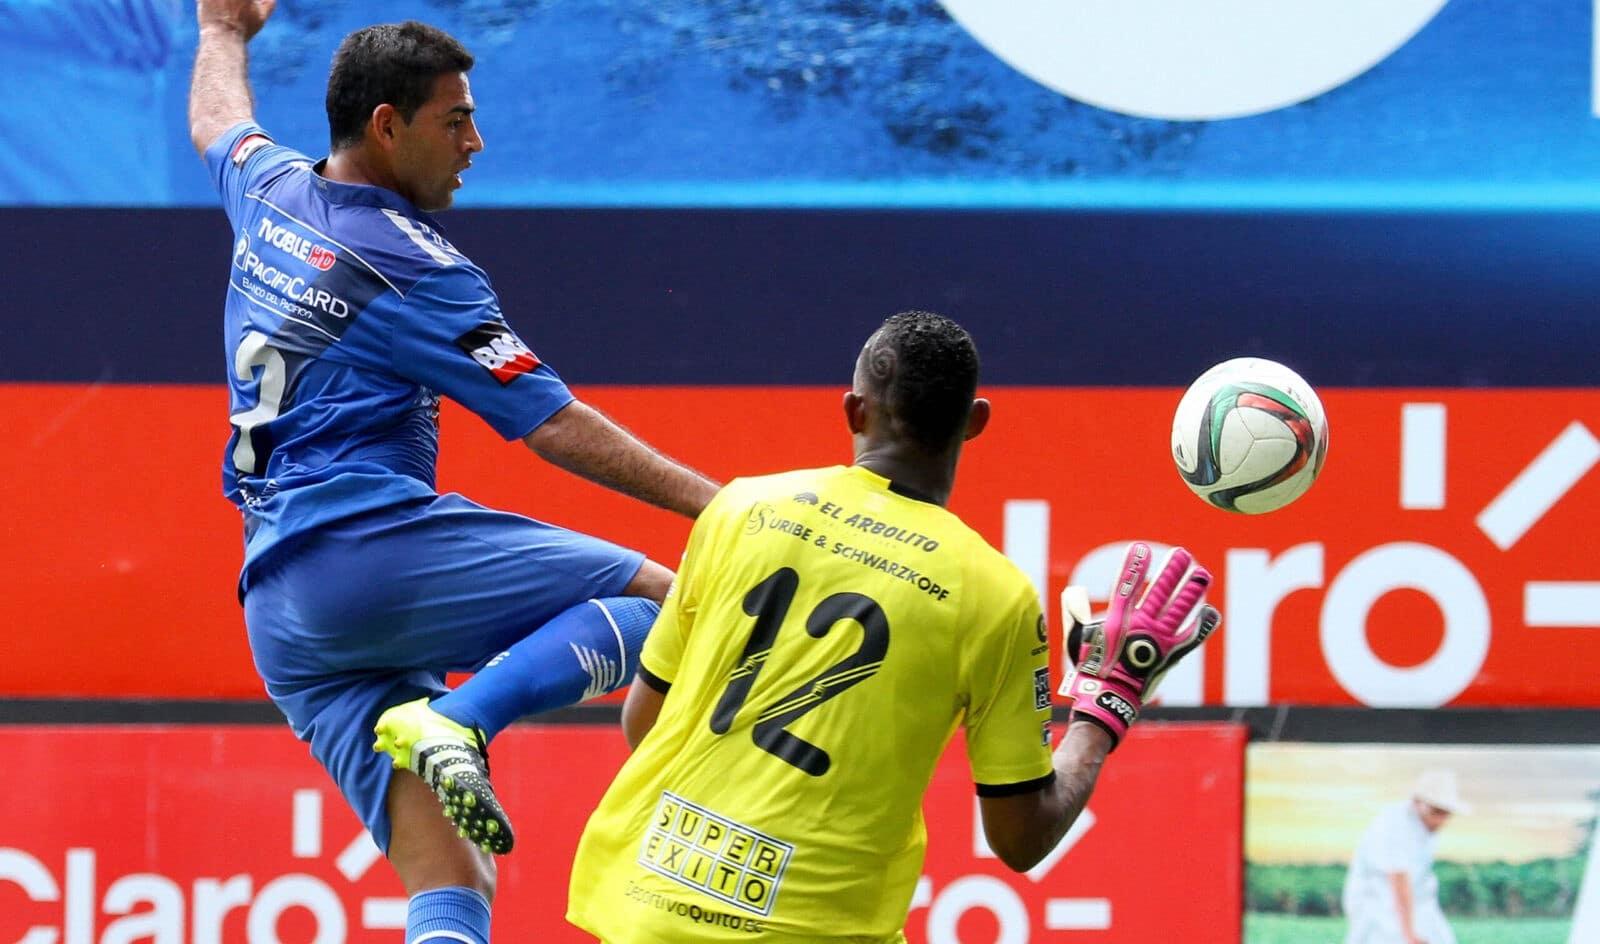 emelec 2 vs 0 deportivo quito (12 de julio 2015)